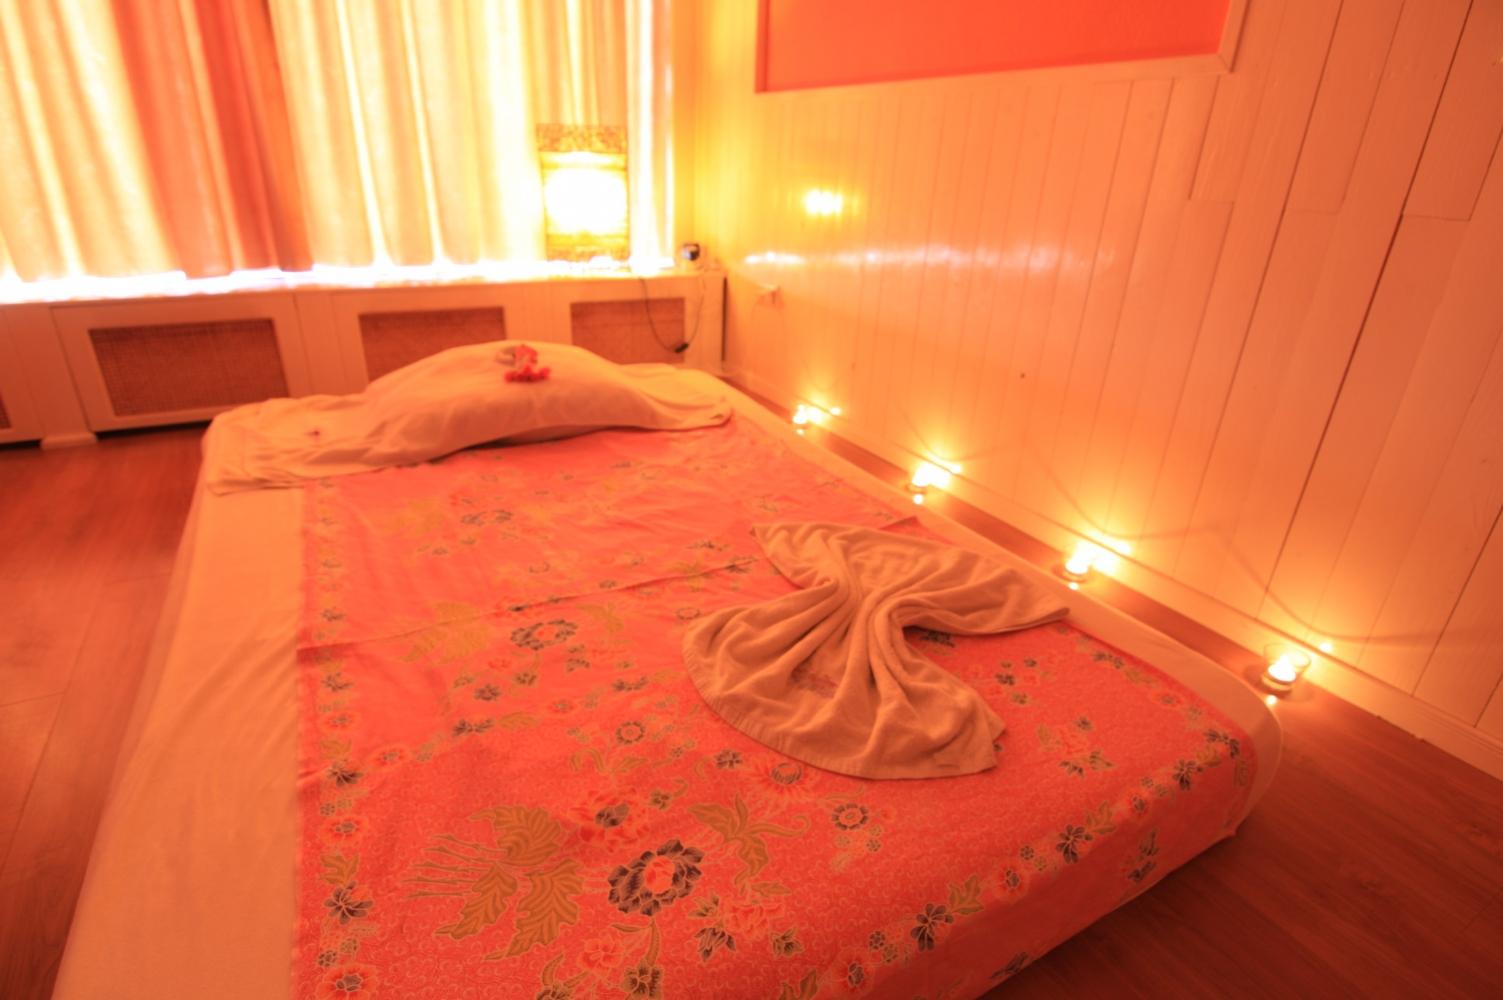 Massage in kamer 39 ayutthaya 39 nijmegen 1 persoons manadrin spa - Spa kamer ...